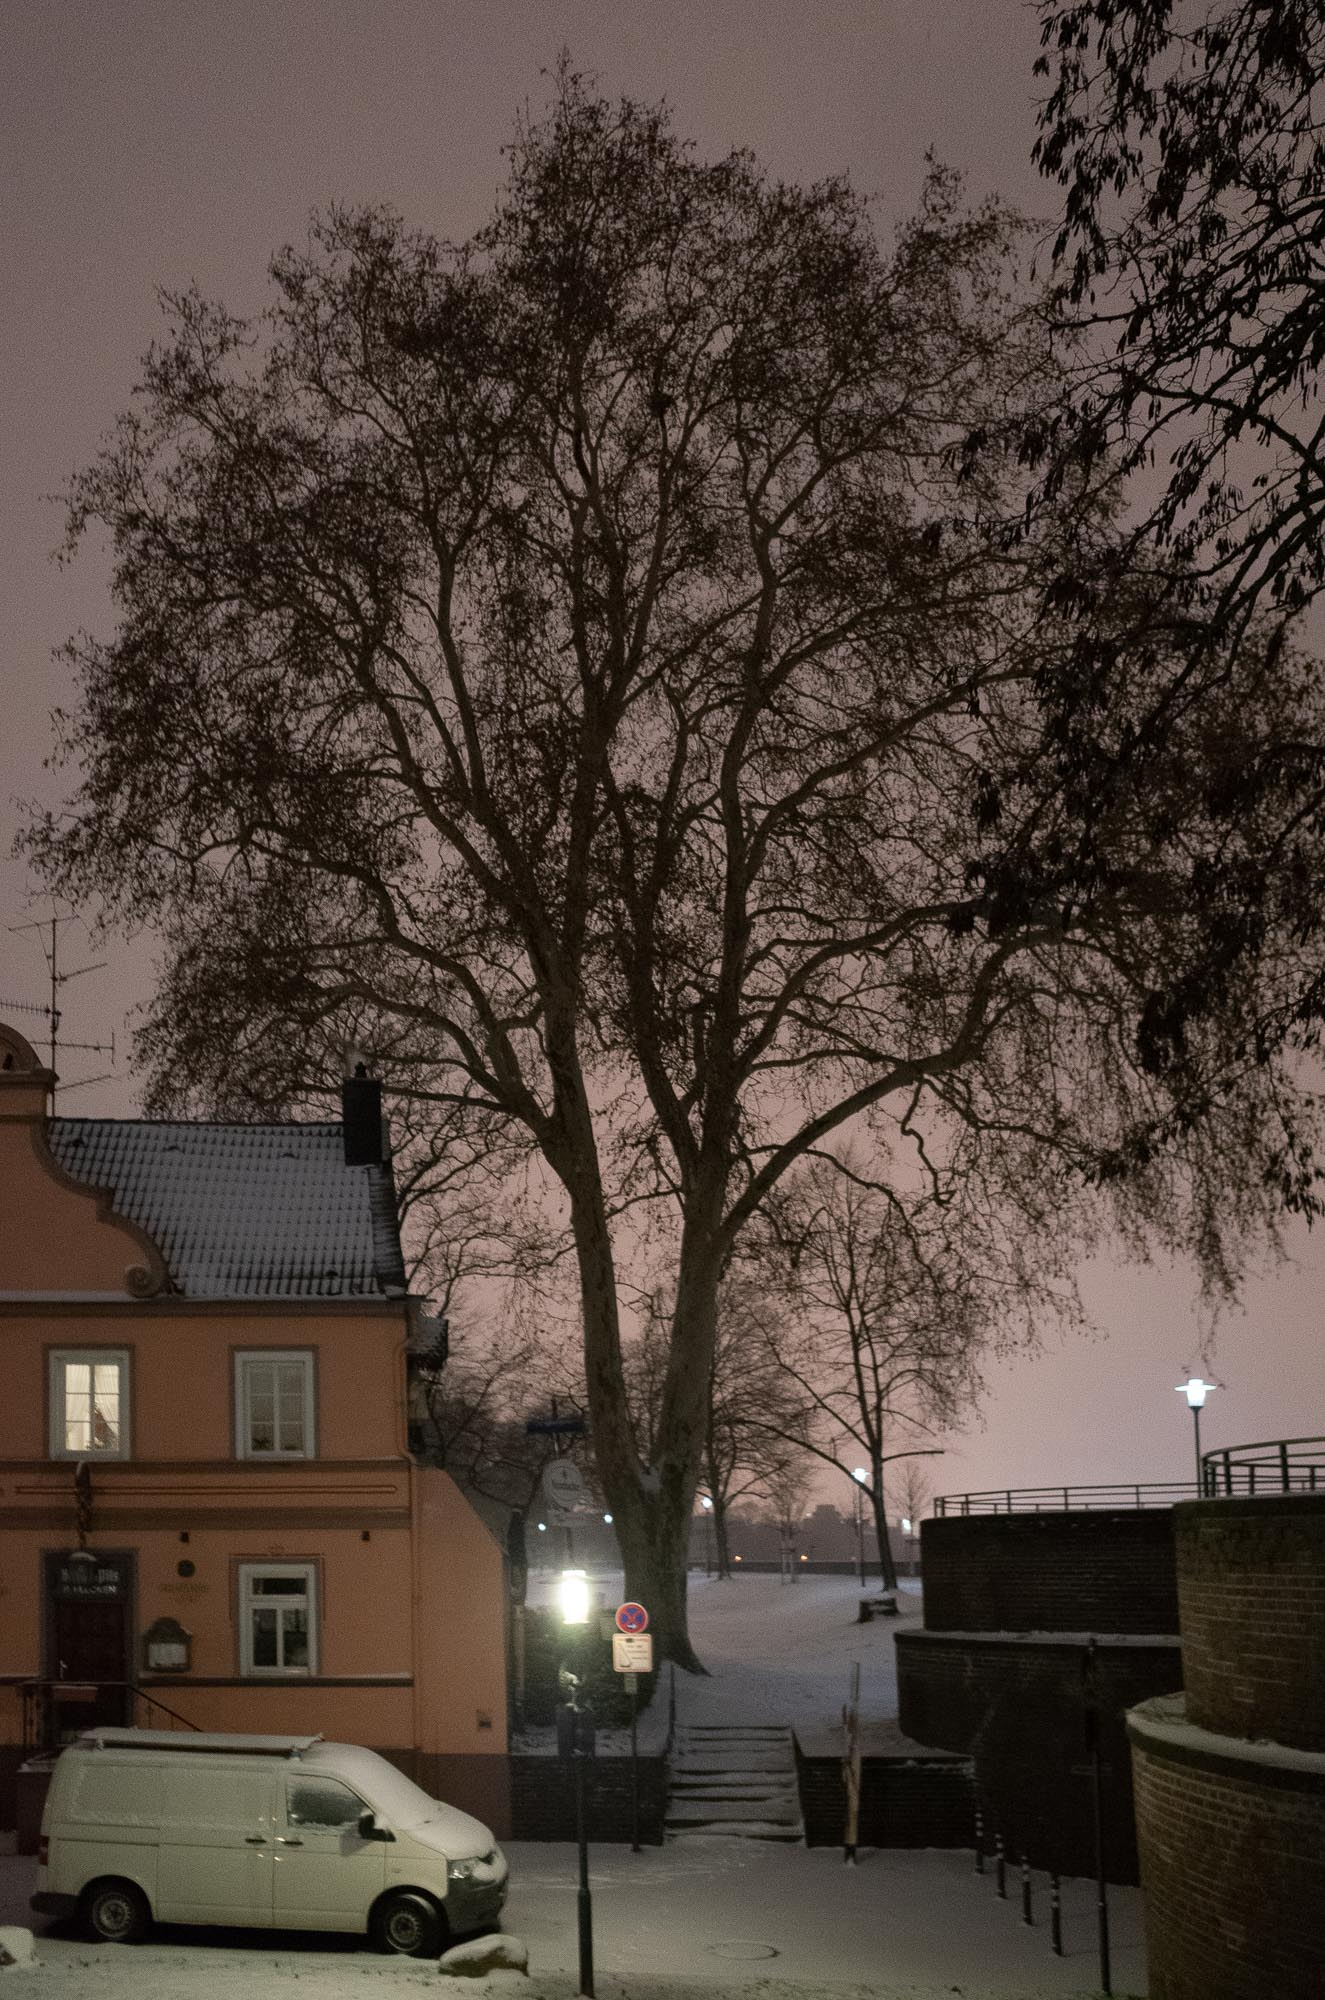 ollo / Schneeweiß